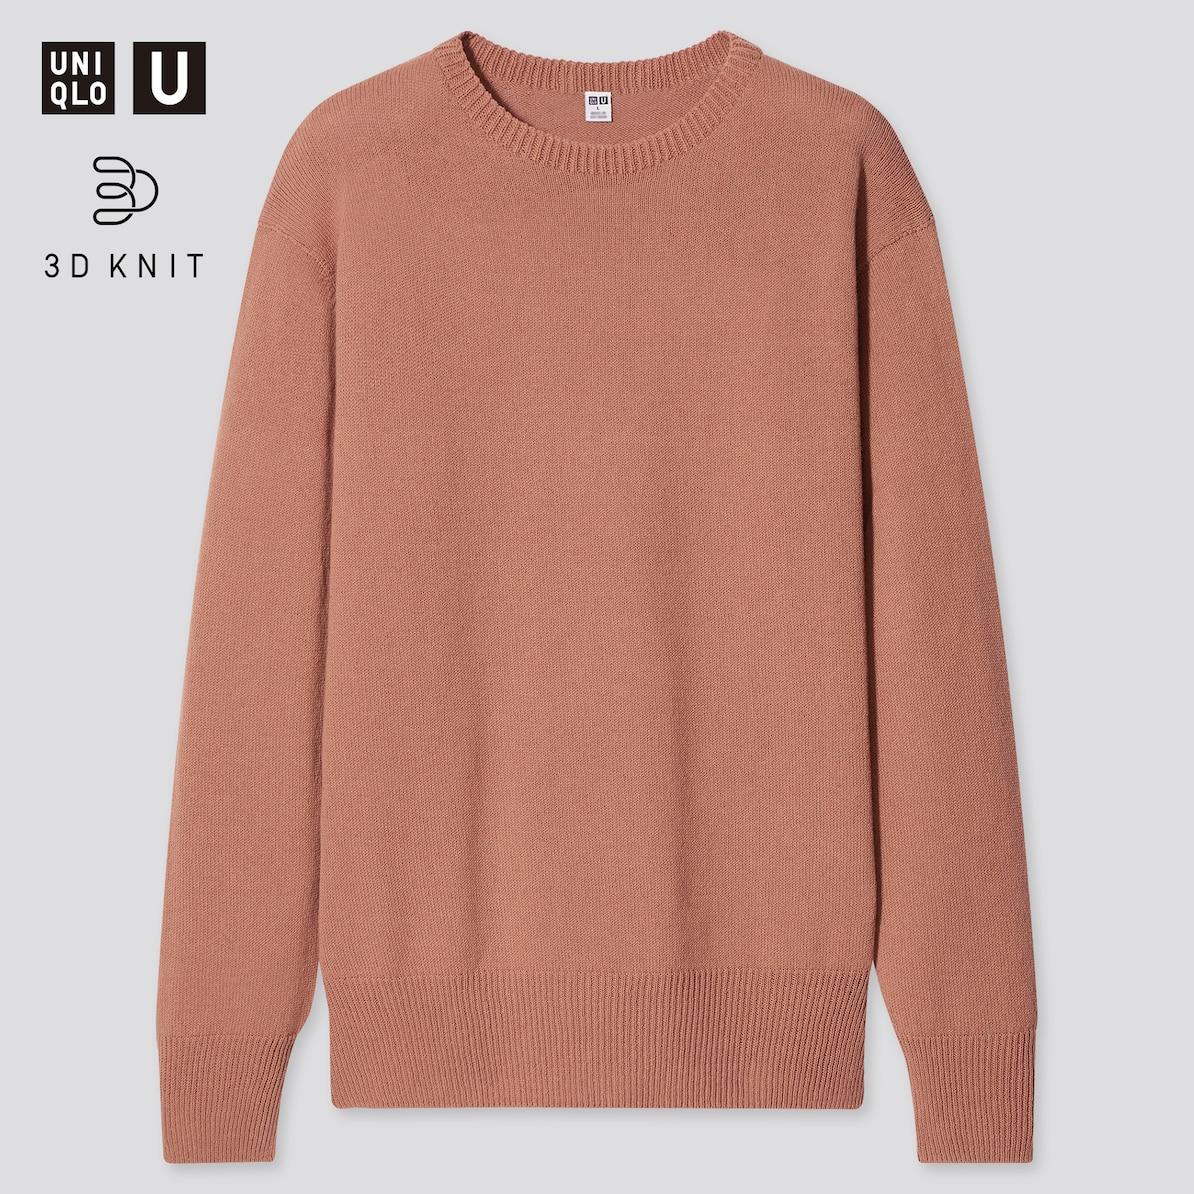 https://image.uniqlo.com/UQ/ST3/AsianCommon/imagesgoods/437346/item/goods_27_437346.jpg?width=1194